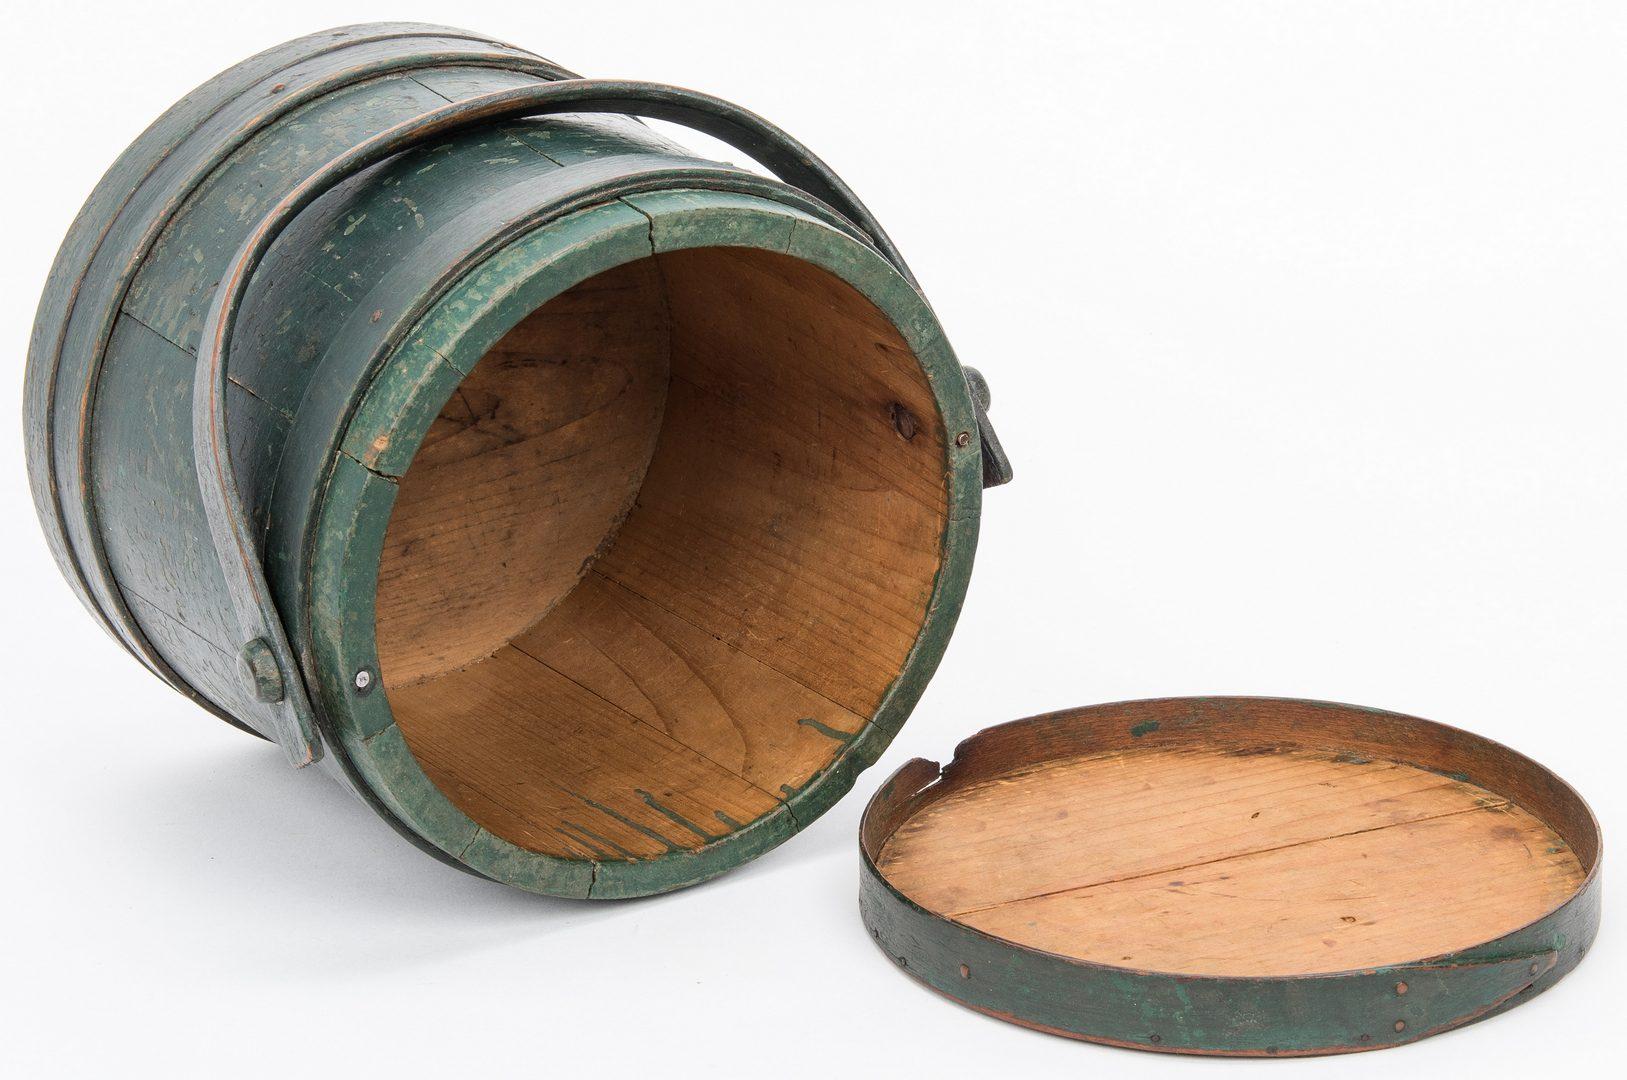 Lot 362: 5 Wood Storage Boxes, 1 Basket & 4 Toys